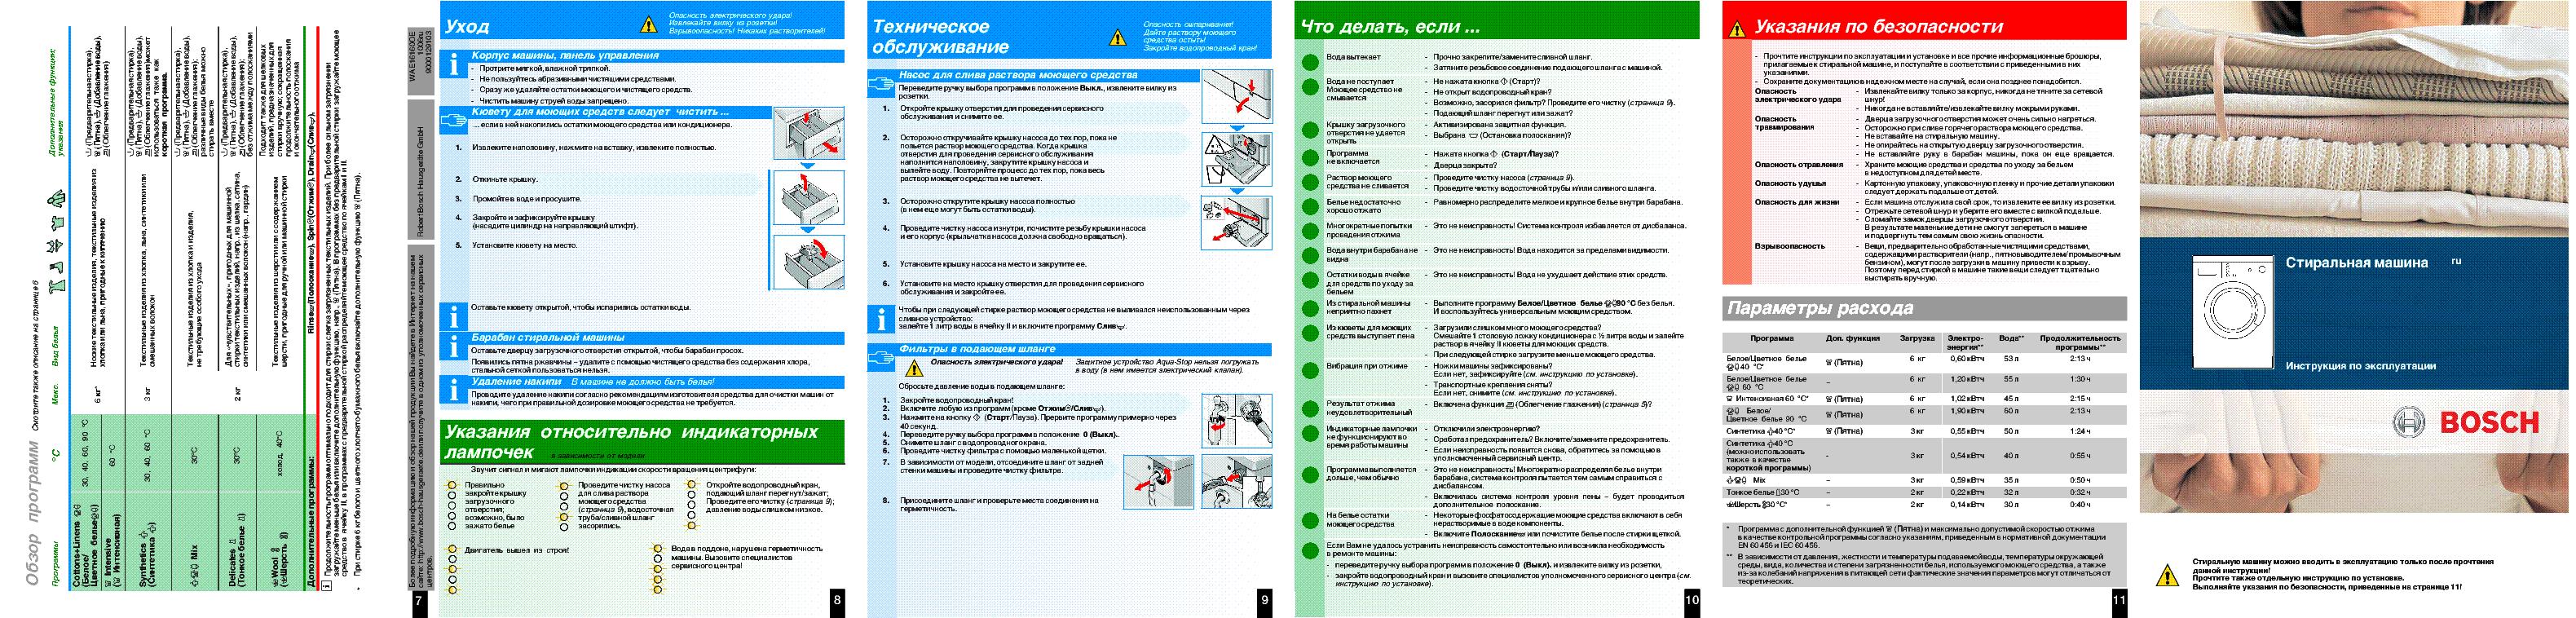 Bosch Dishwasher Repair Manual Download Free